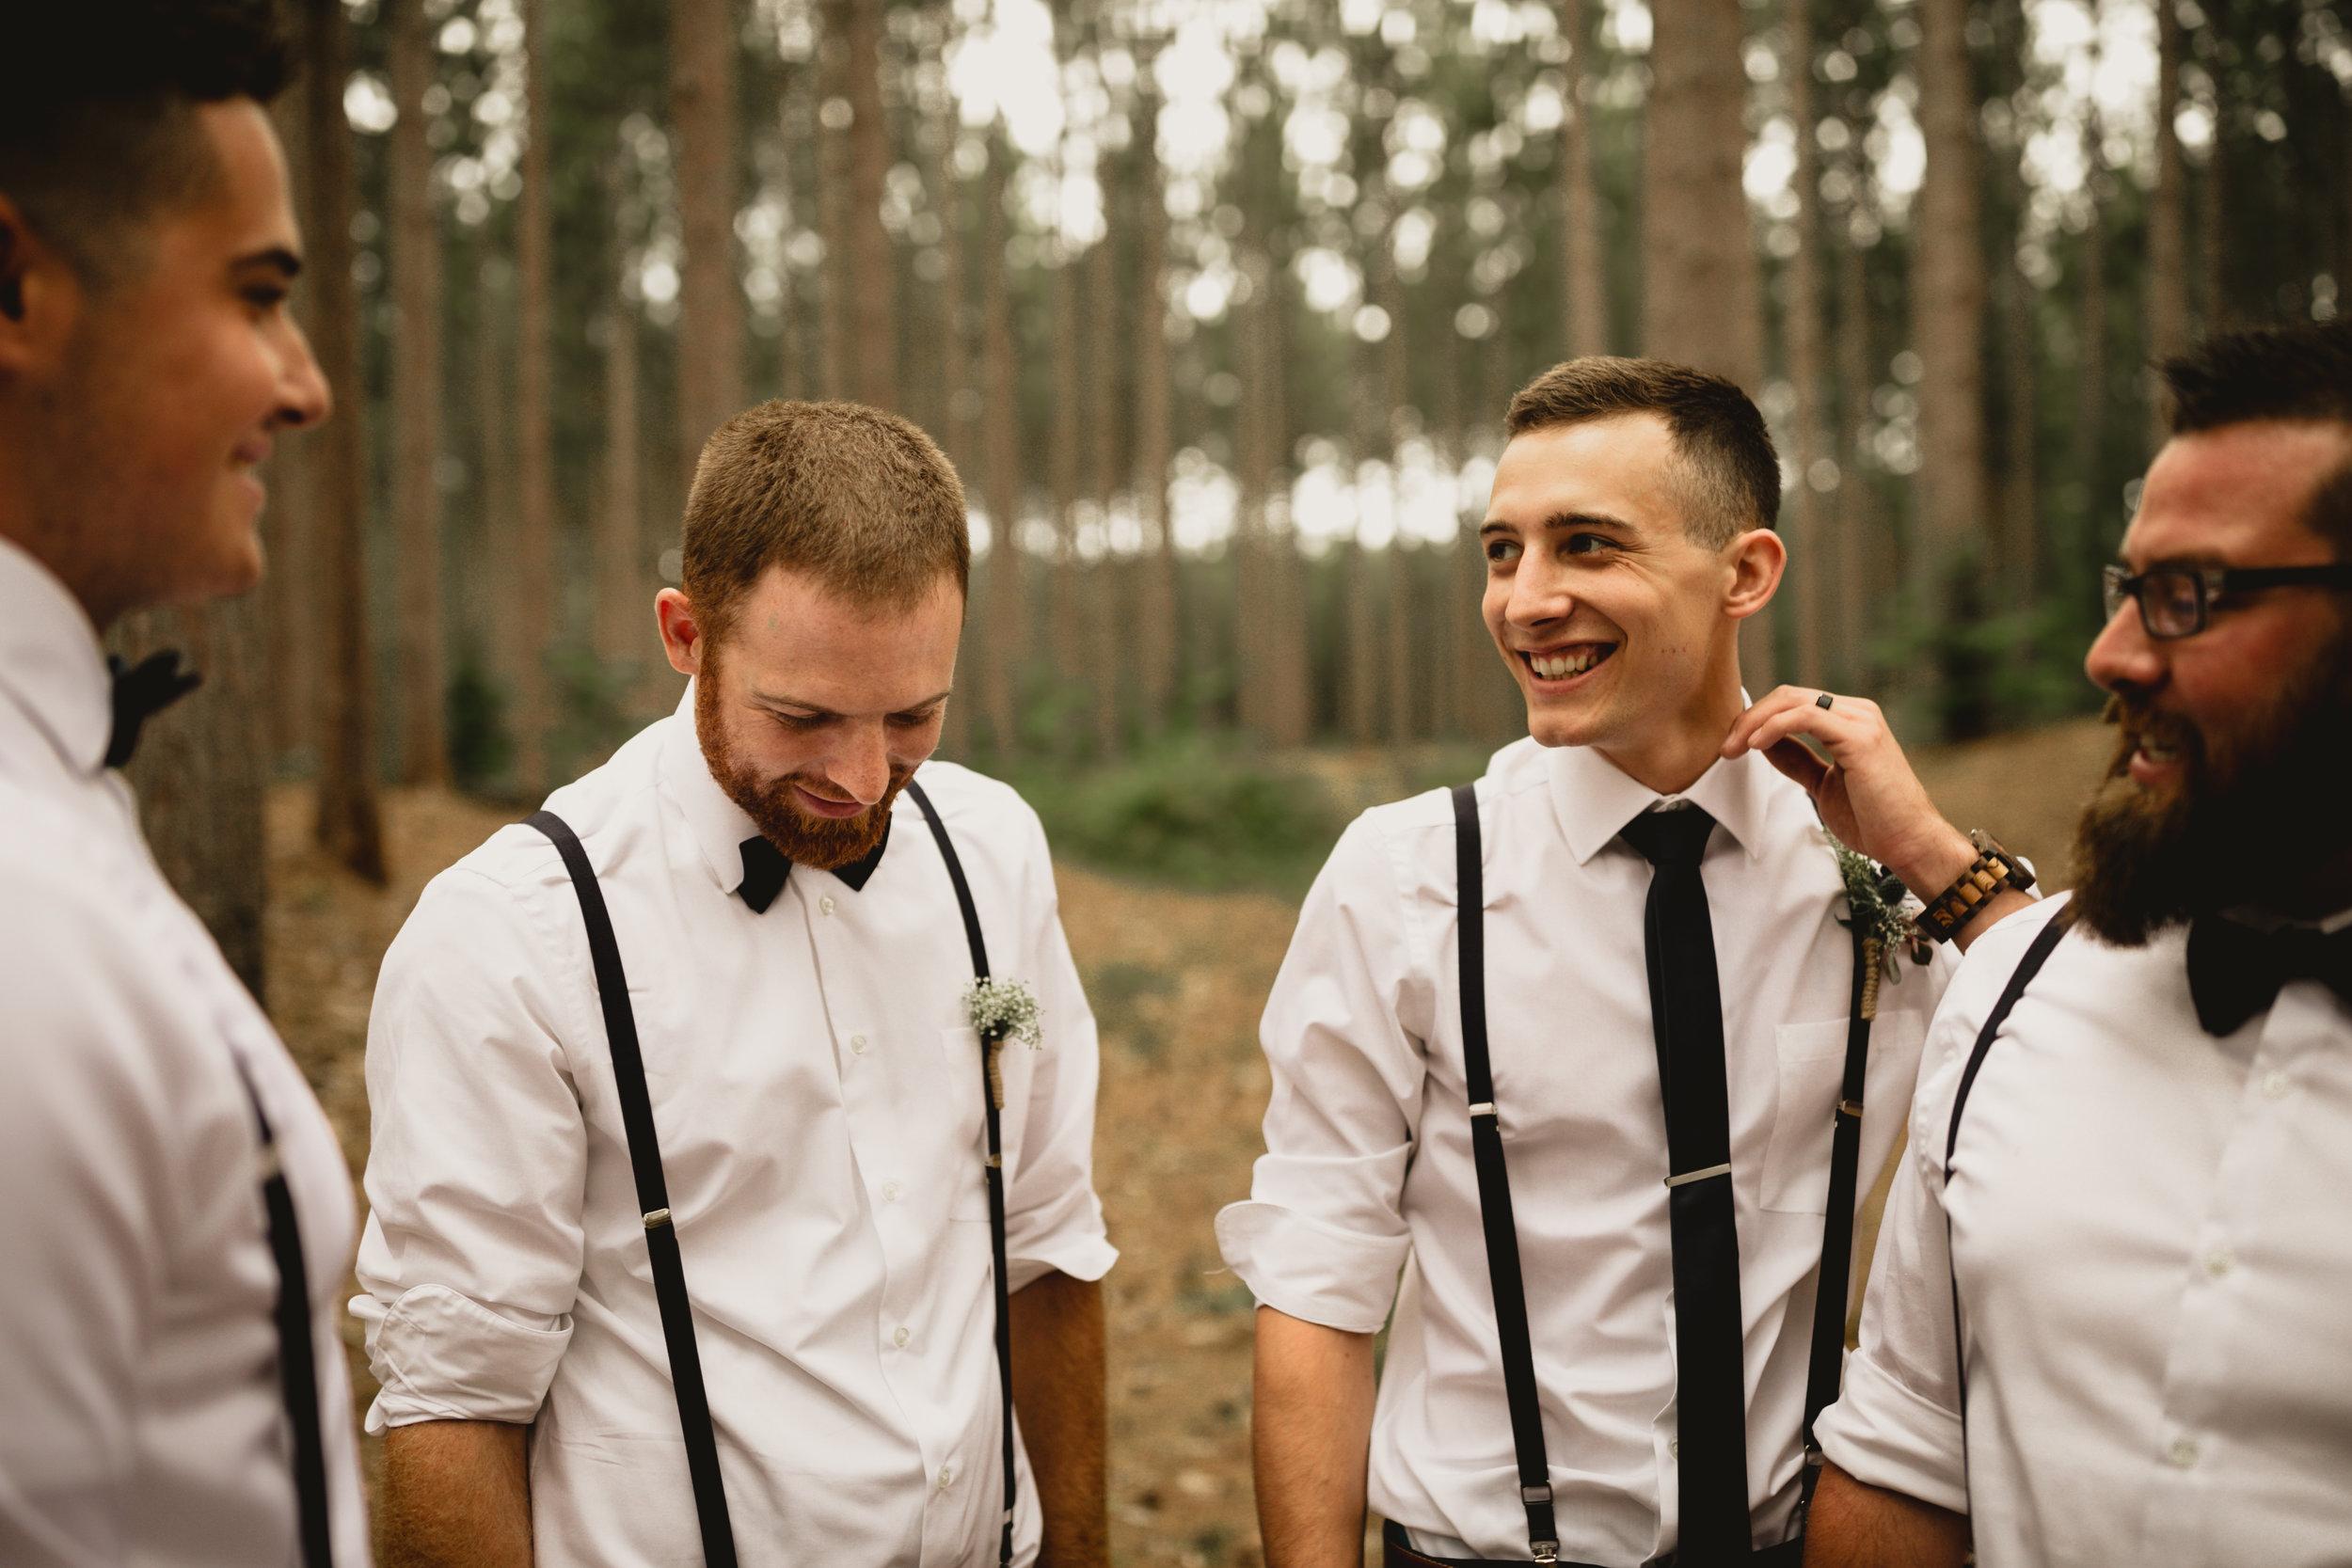 west-michigan-wedding-photographer-whitehall-rachel-austin-chapel-in-the-pines-434.jpg